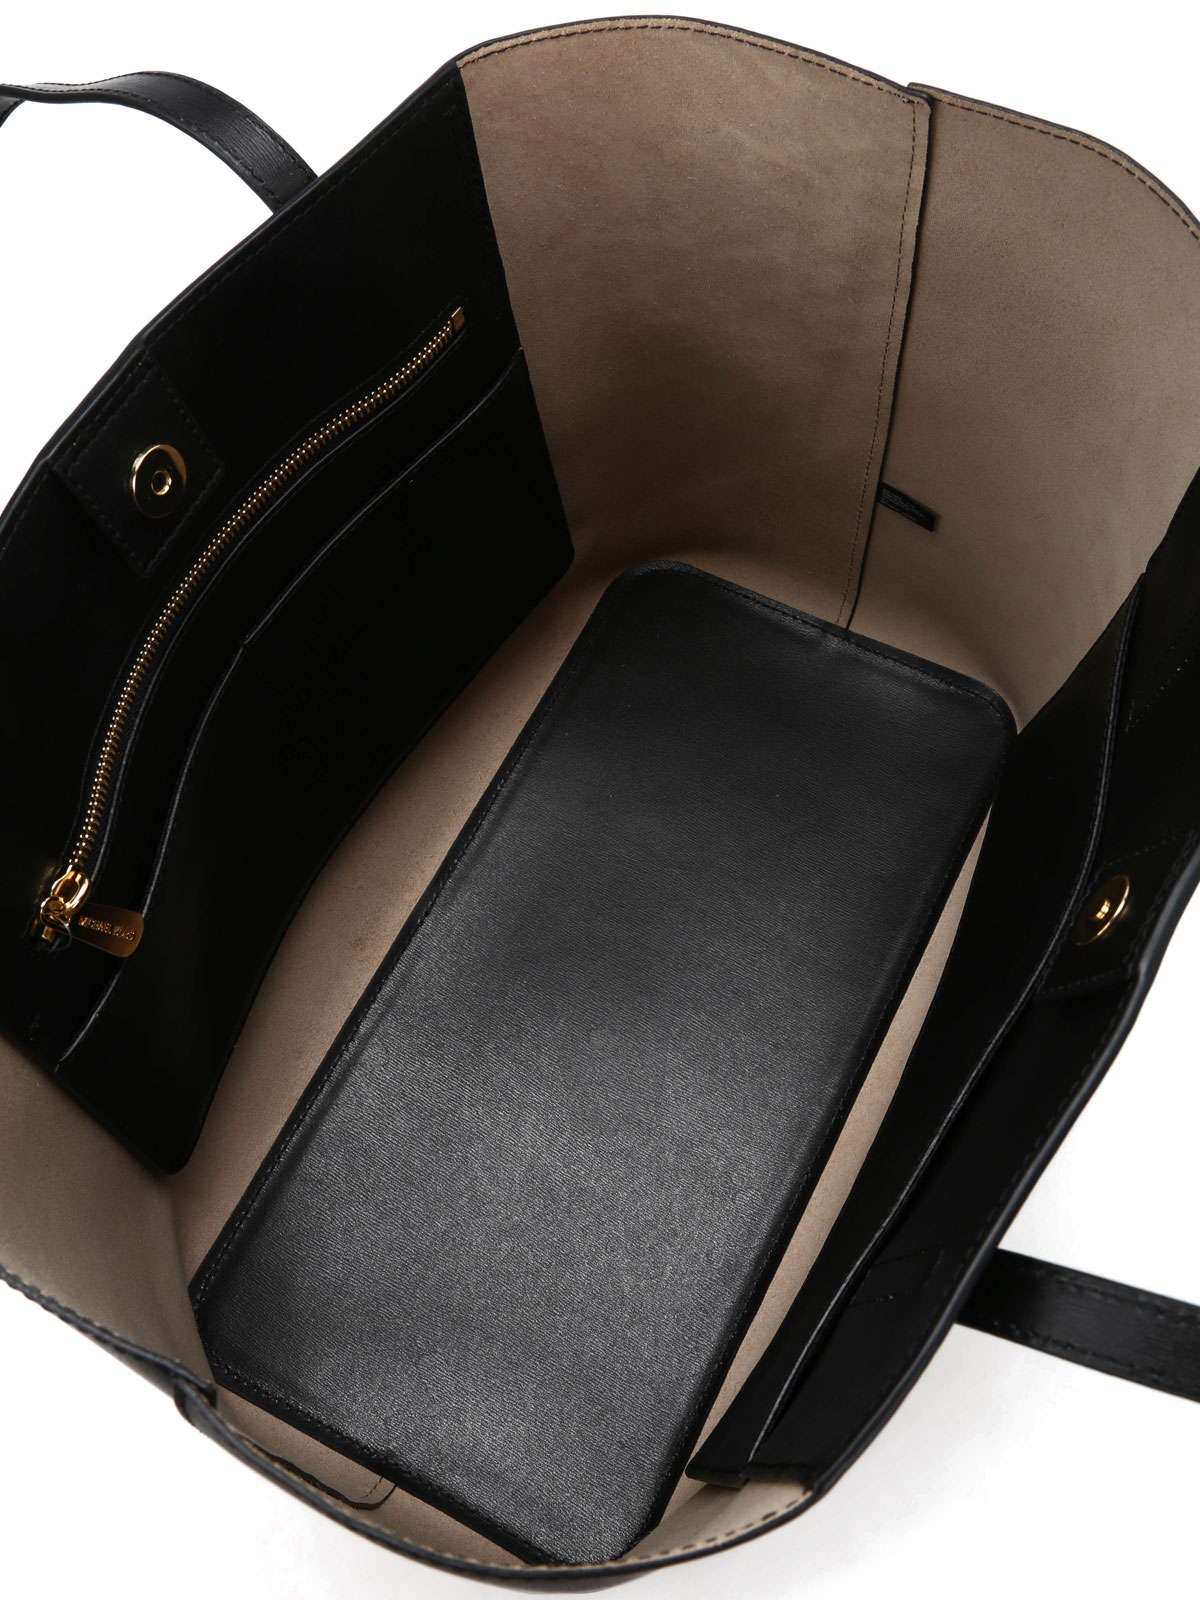 450a74deb0218 Michael Kors - Emry large tote - totes bags - 30F6GE4T3L 001